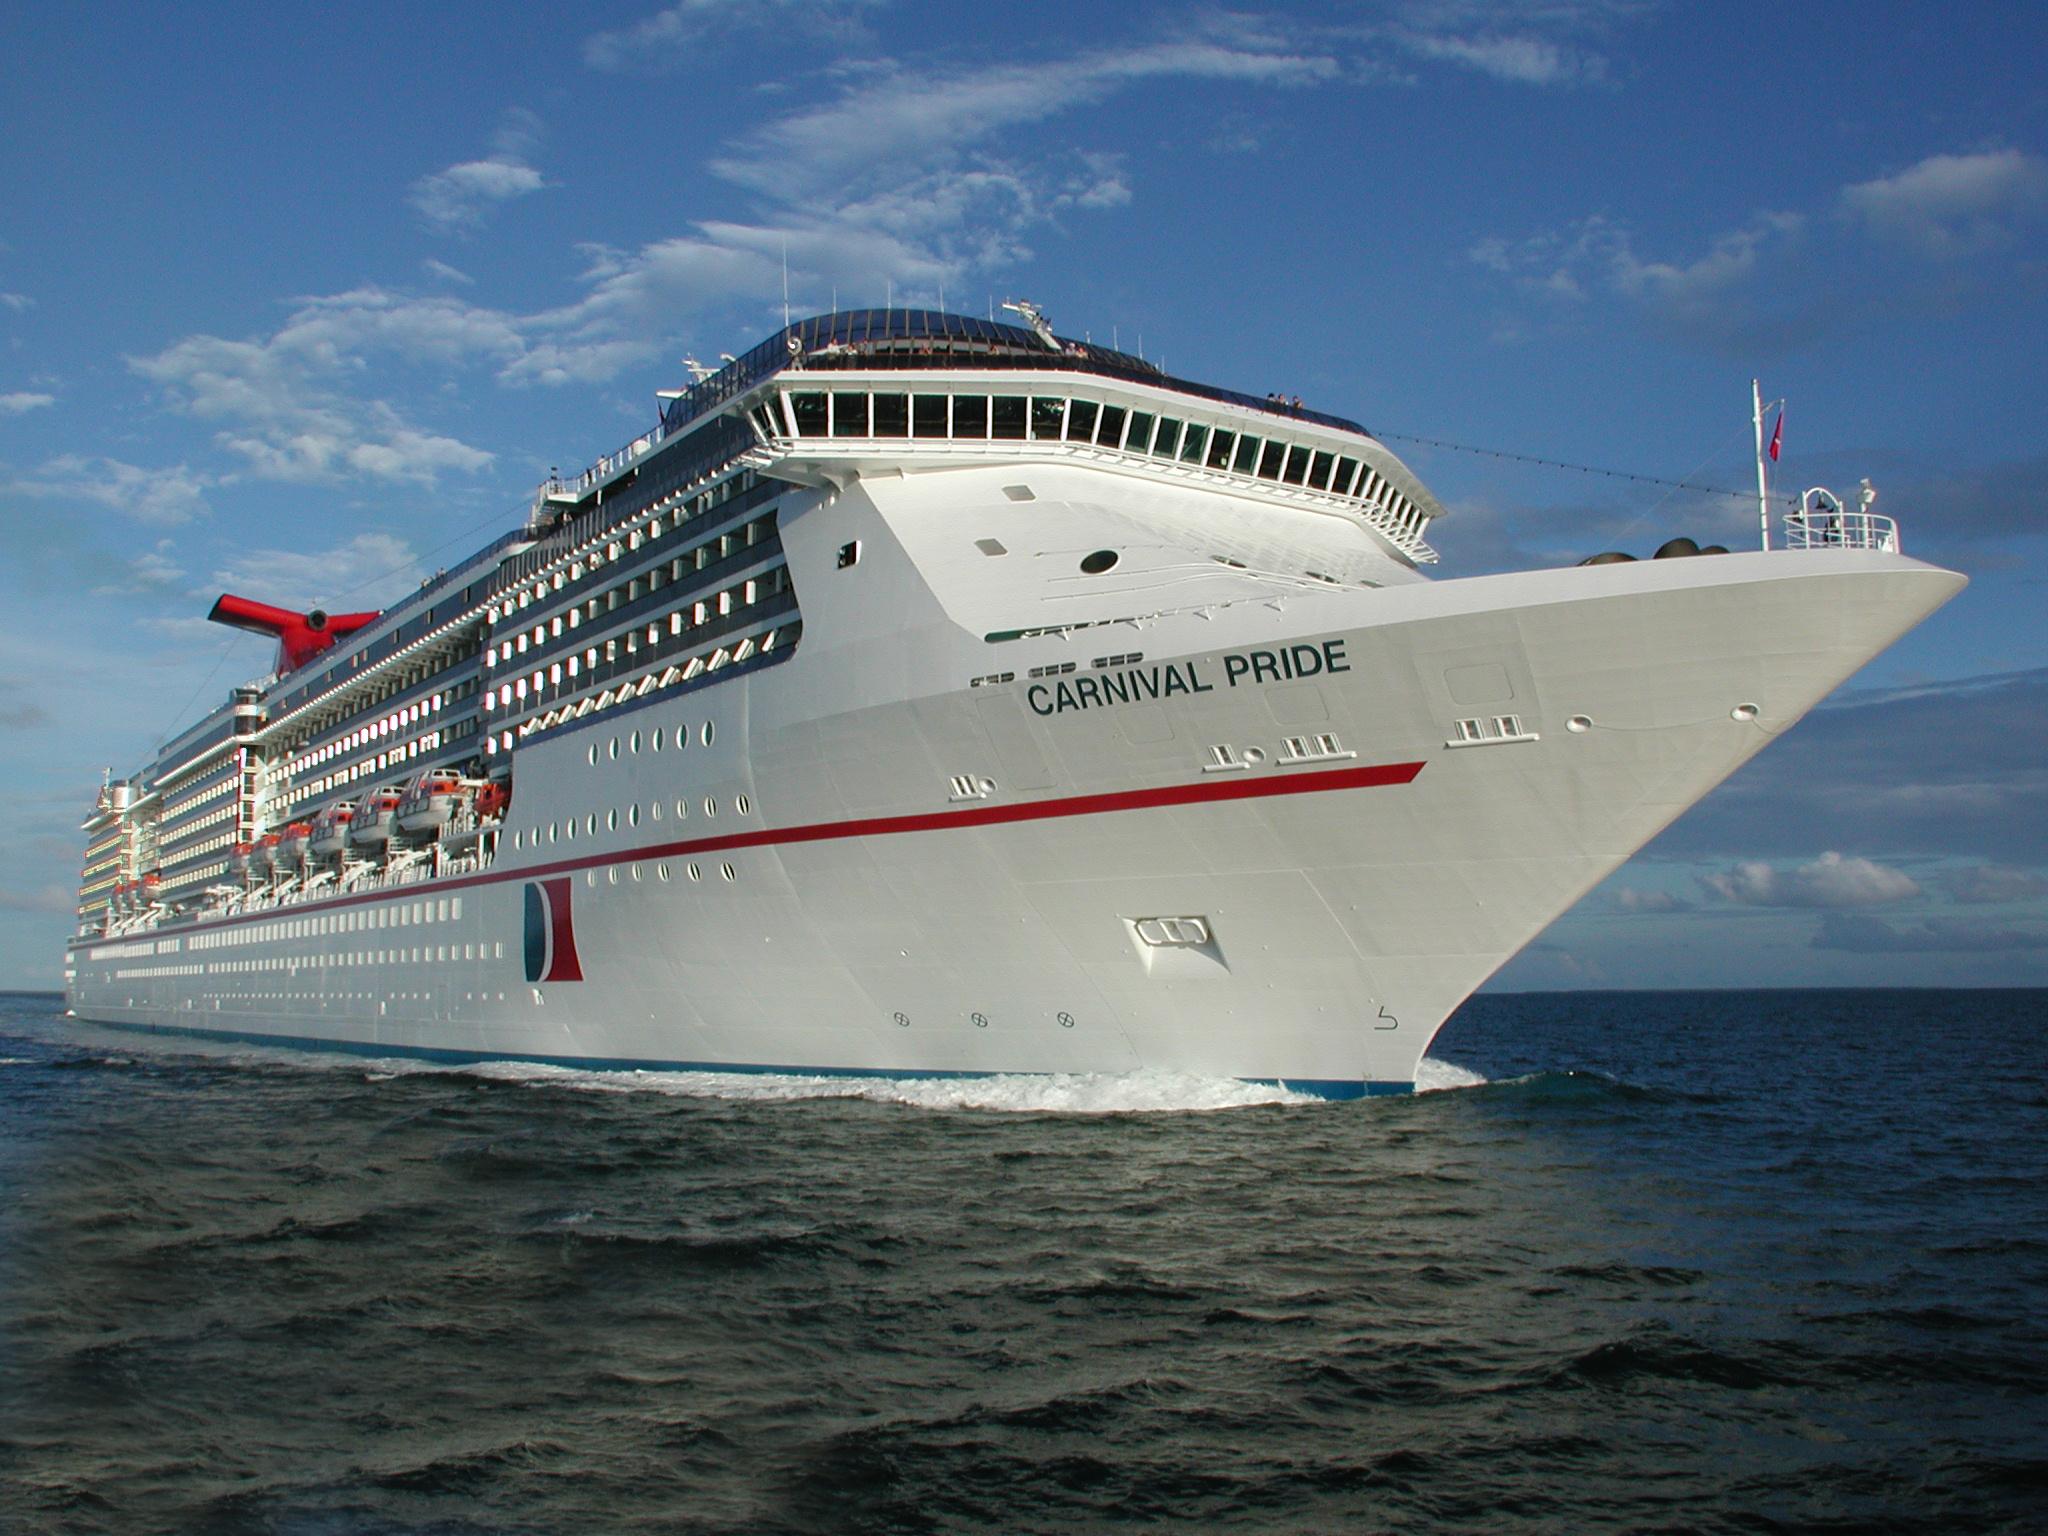 Bermuda cruise deals best cruises to bermuda - 7 Night Bermuda With Carnival Pride Bermuda Cruise